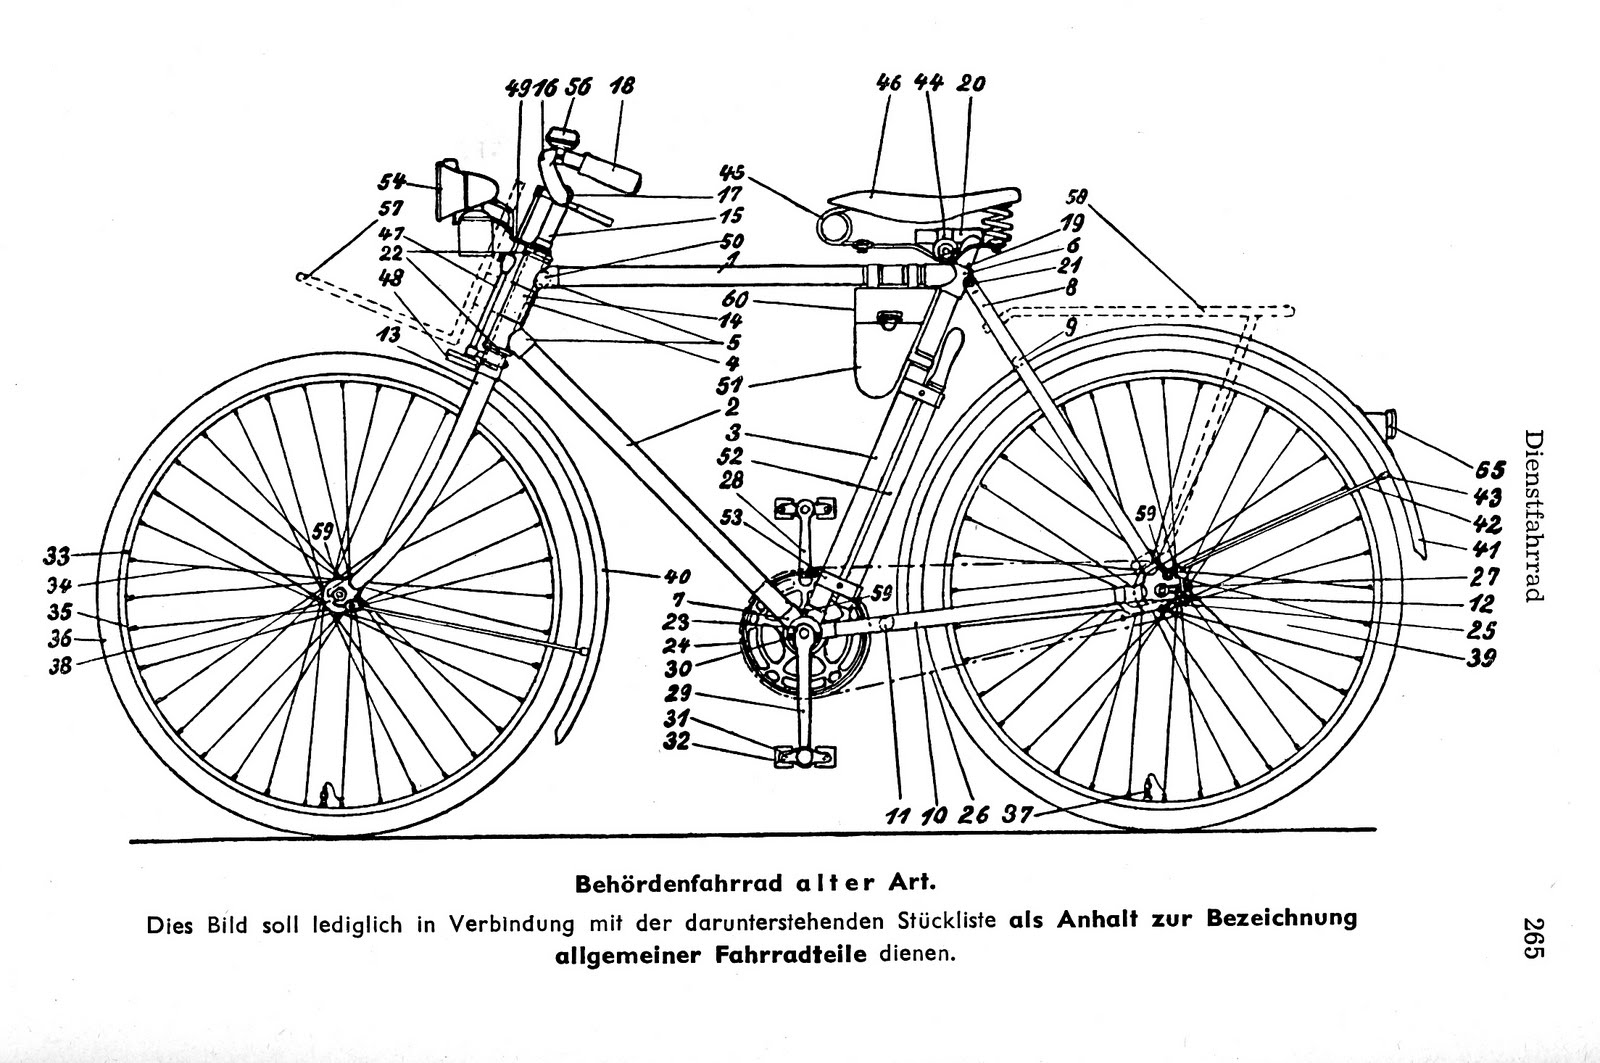 Old Bicycle Diagram Manual Guide Wiring Mountain Bike Trusted Rh 7 Nl Schoenheitsbrieftaube De